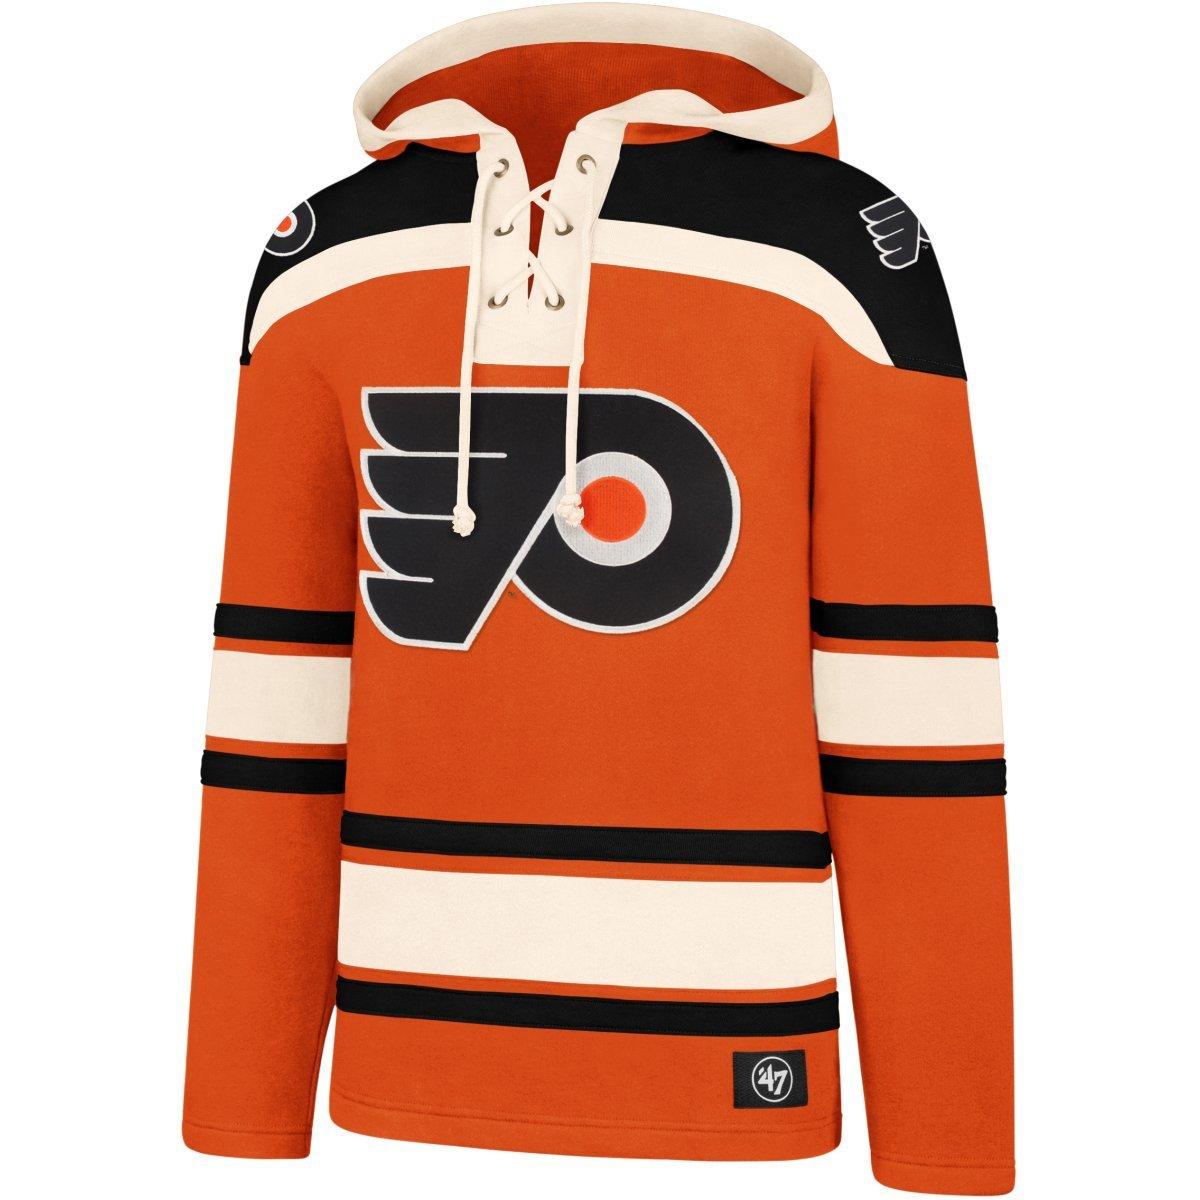 '47 Brand Philadelphia Flyers Lacer Jersey Hoodie NHL Sweatshirt